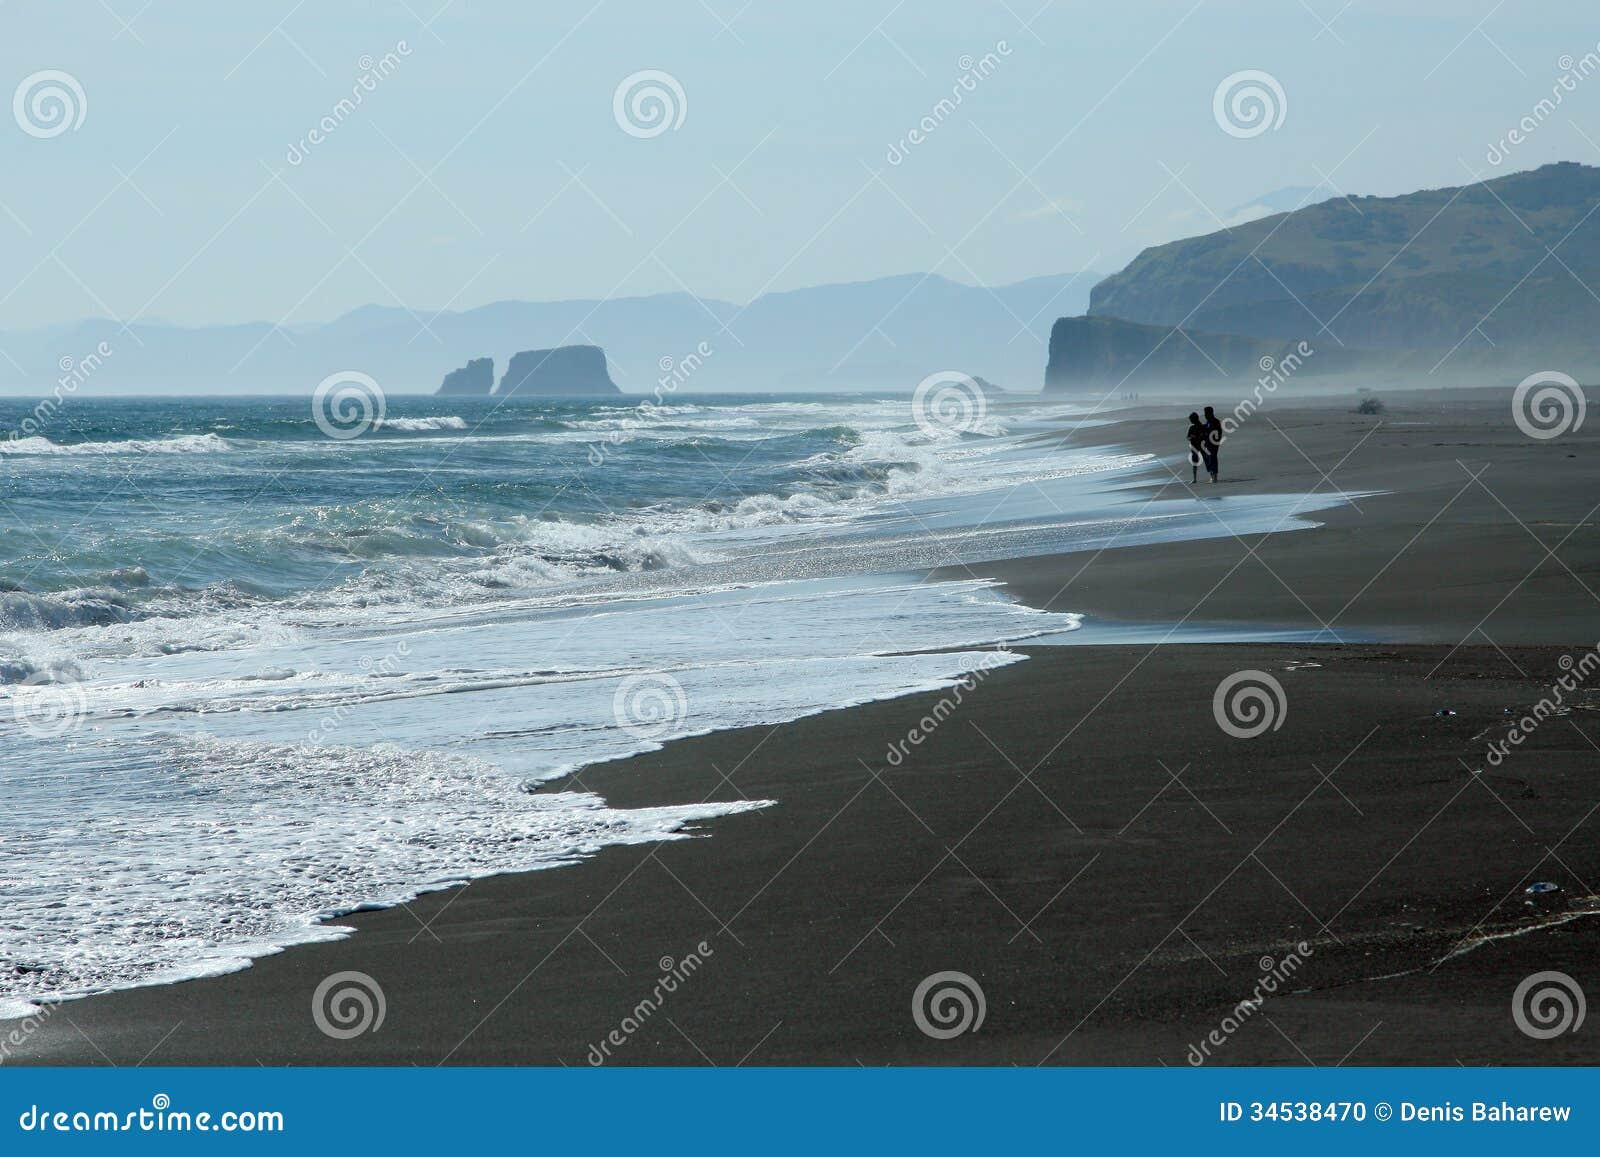 surfing mr petrovic essay